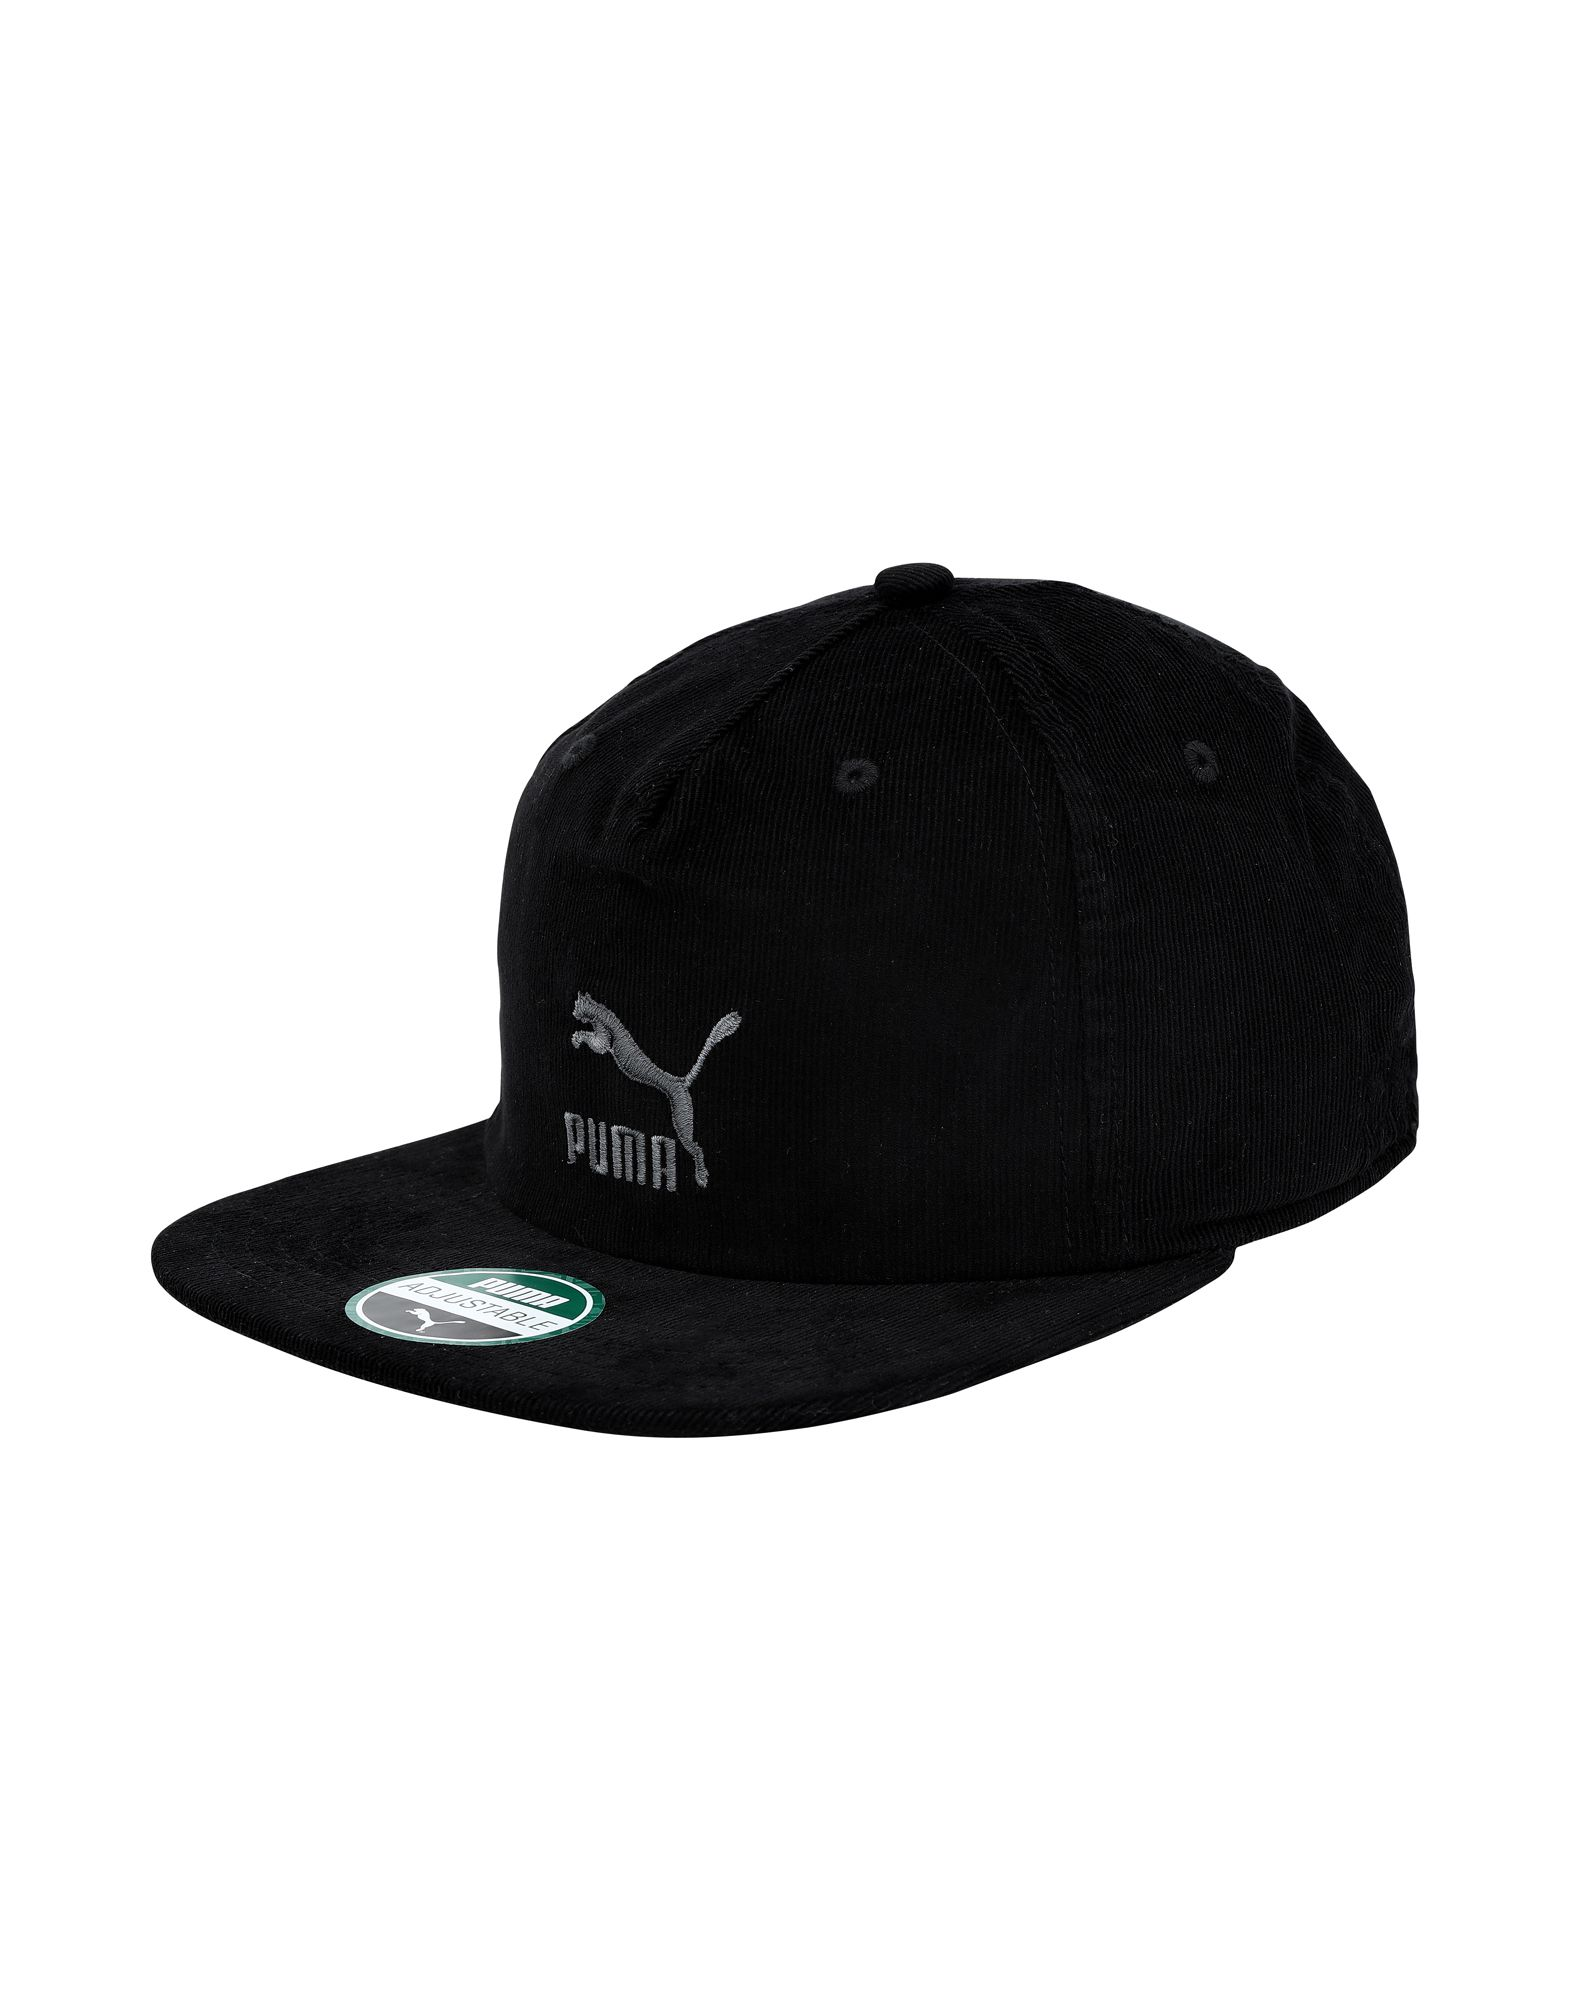 Puma Archive Downtown Fb Cap Ac - Hat - Men Puma Hats online on YOOX ... 1e2a68f0525